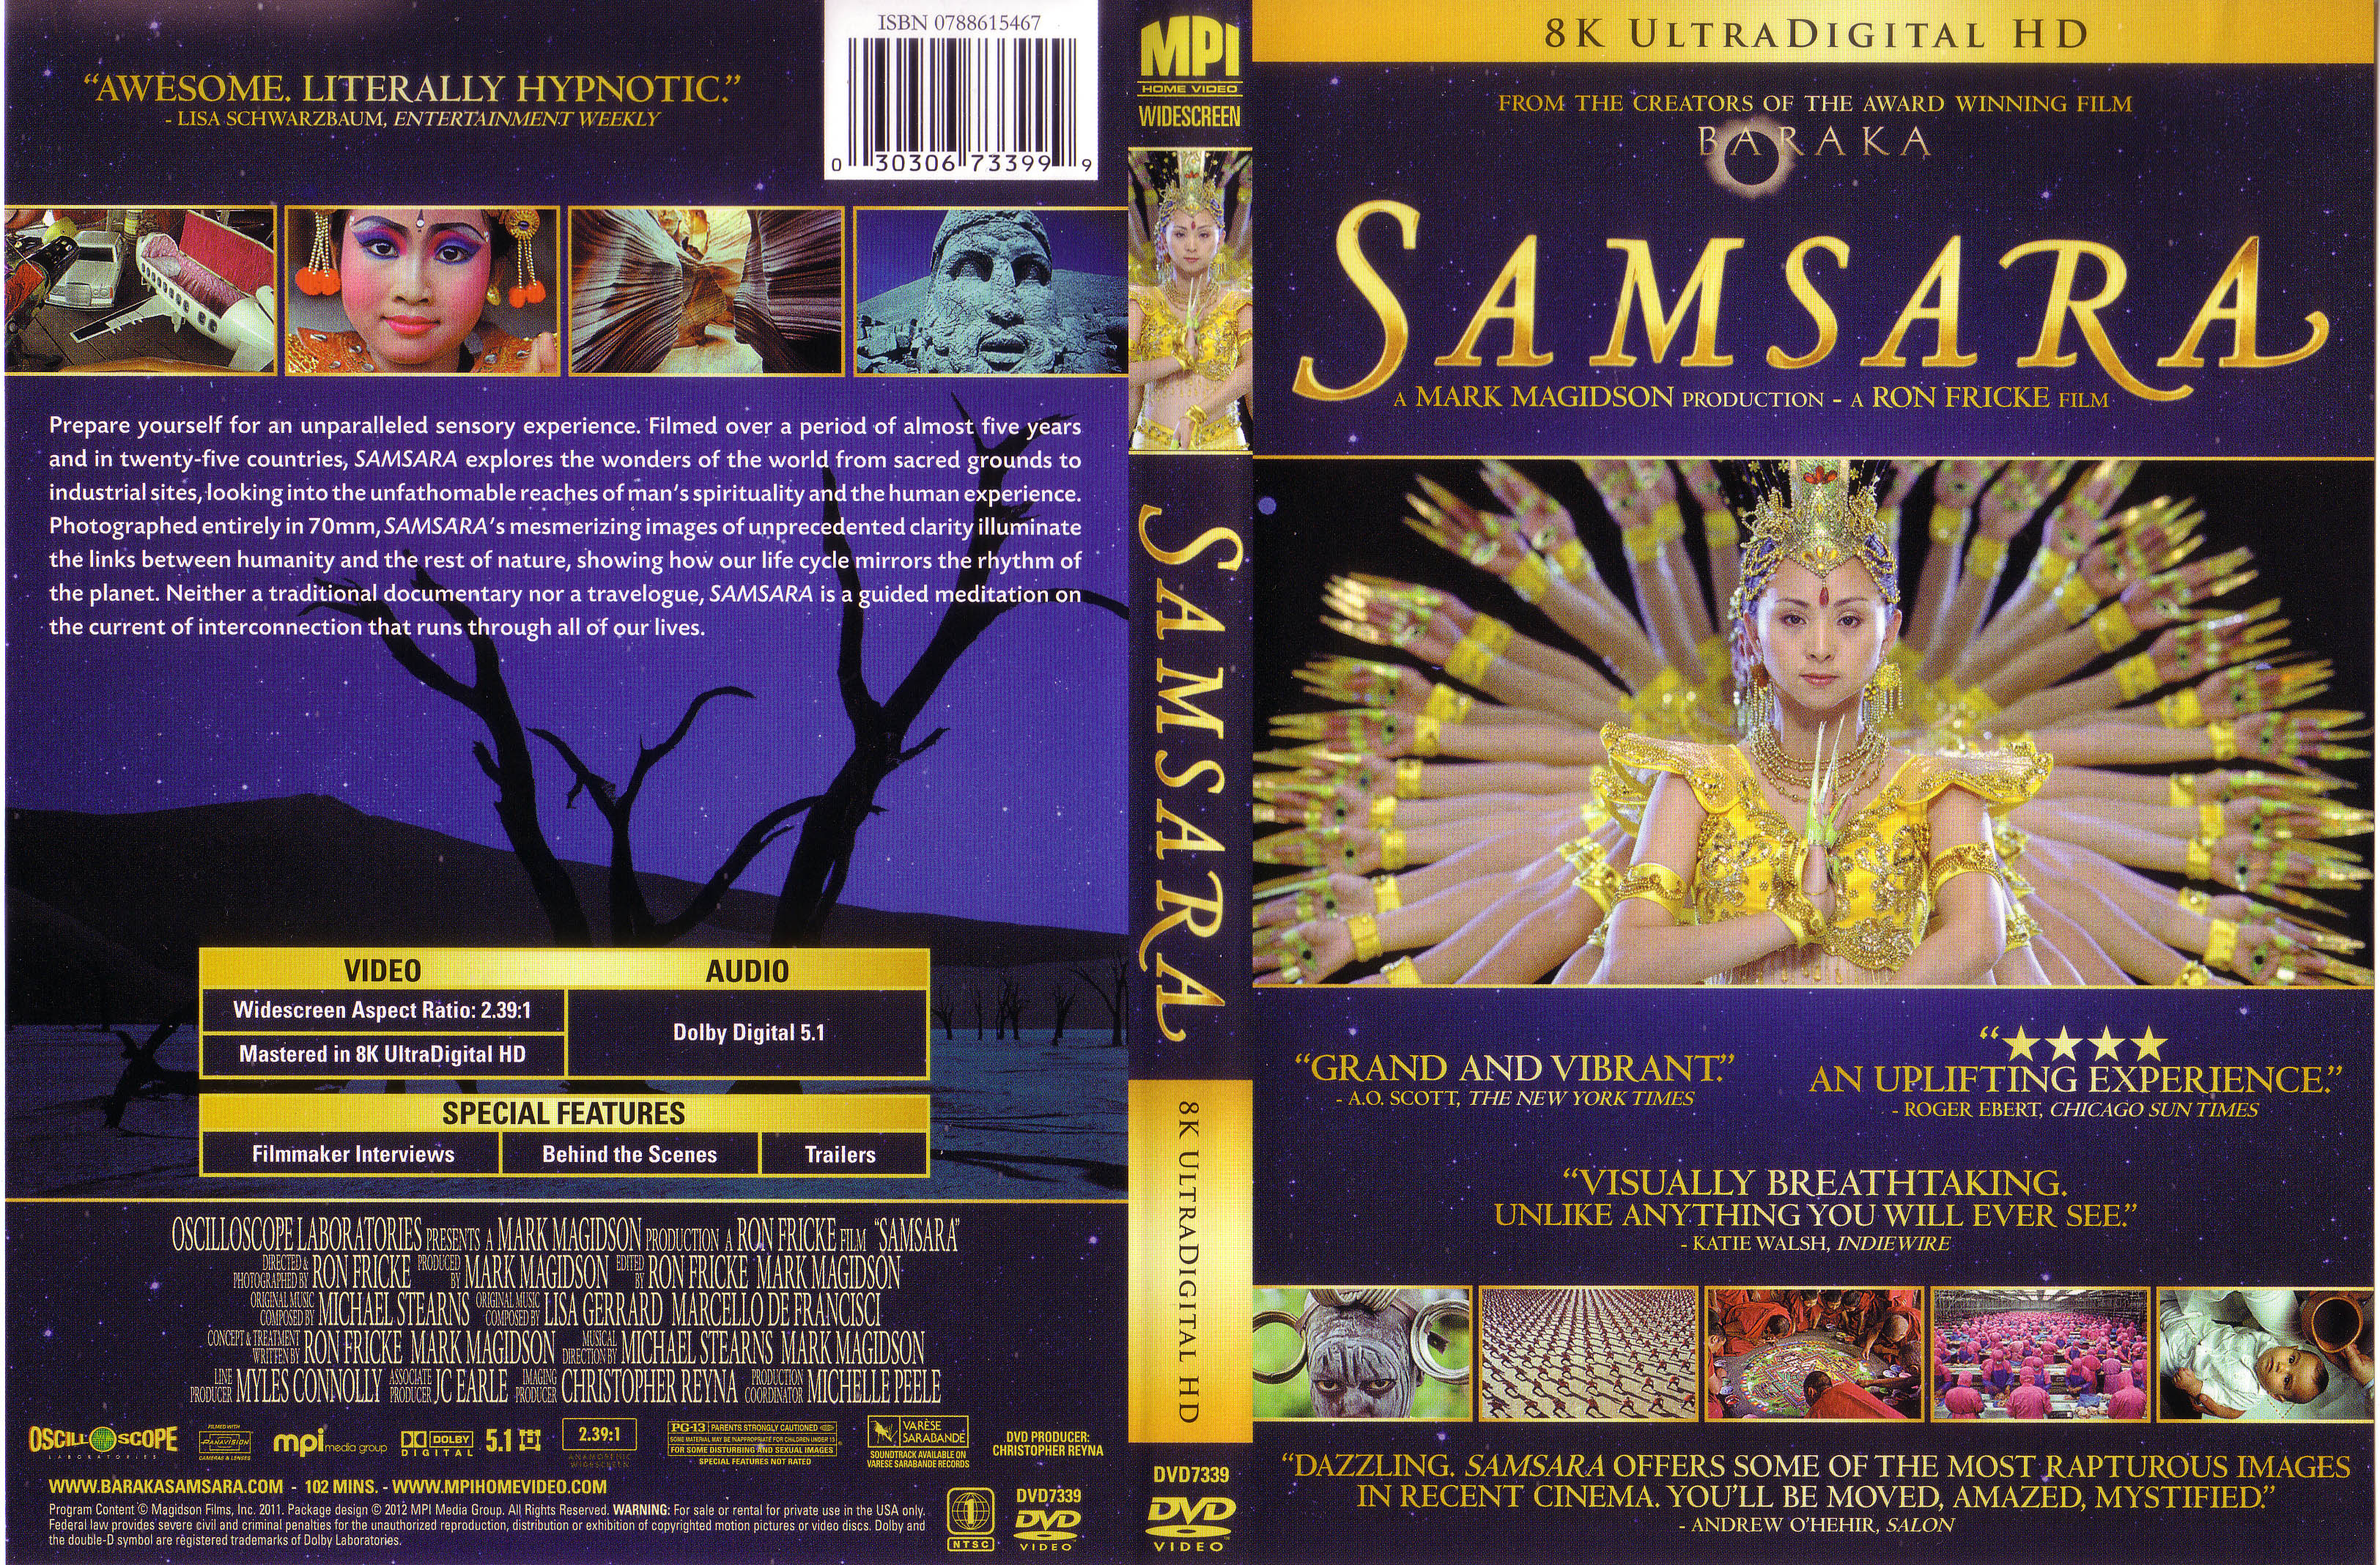 samsara film 2011